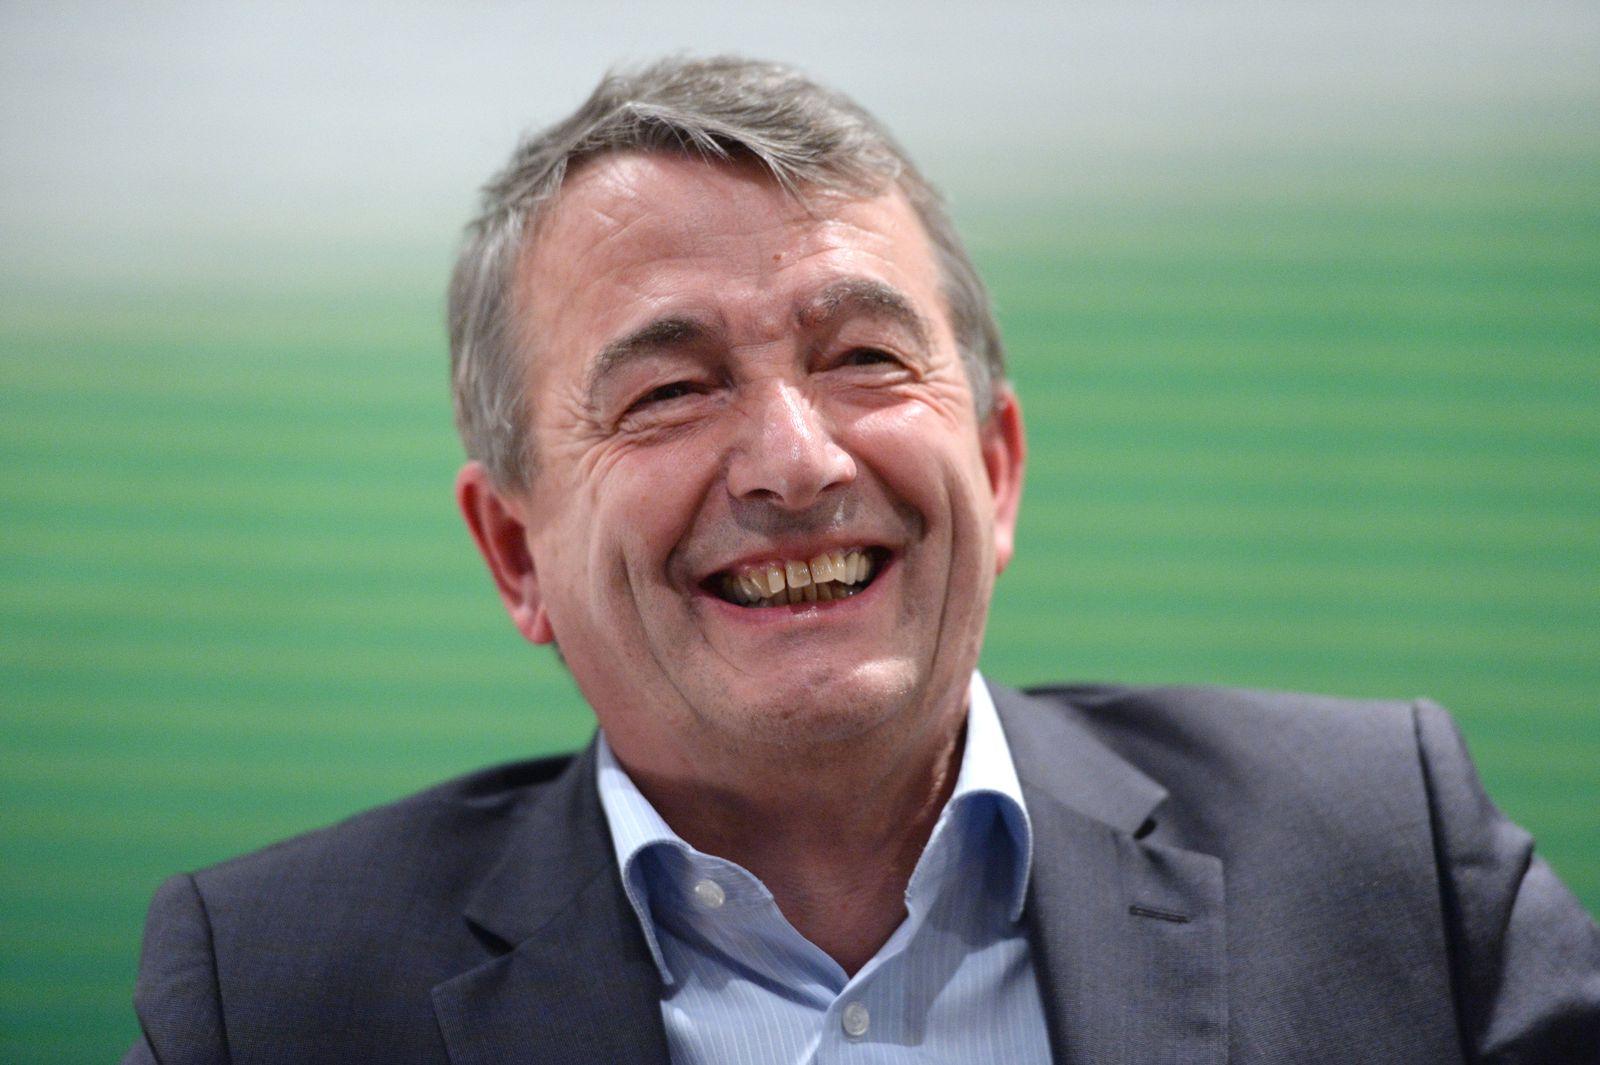 DFB-Päsident Wolfgang Niersbach in Hamburg